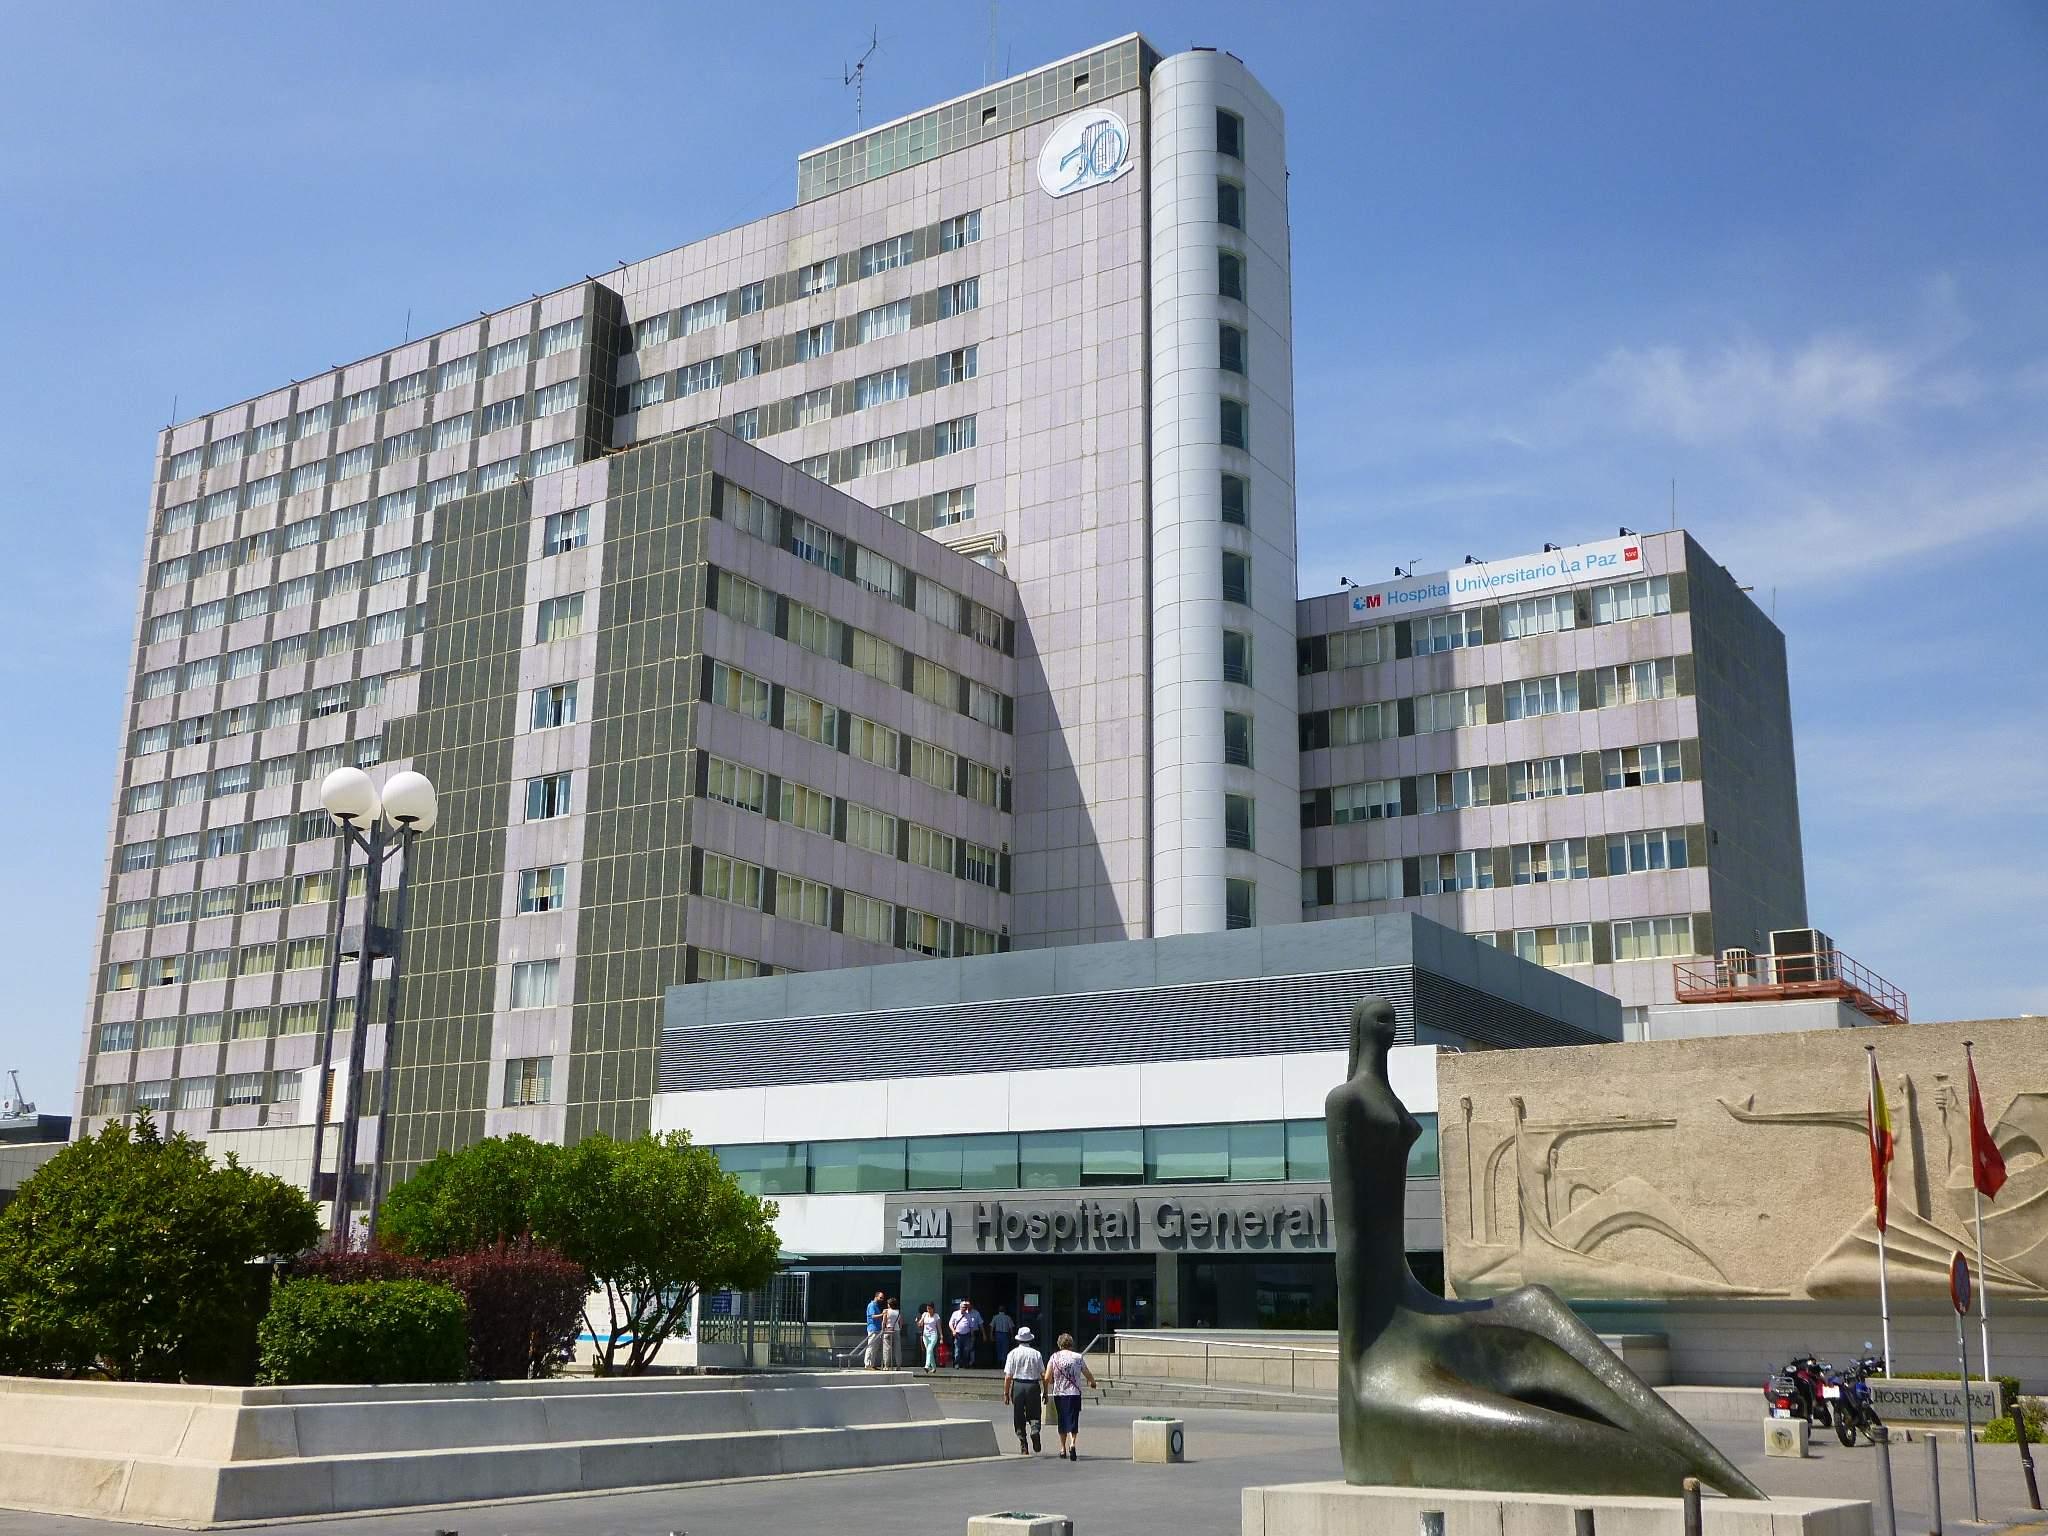 Farmacia hulp informaci n a pacientes - Hospital materno infantil la paz ...